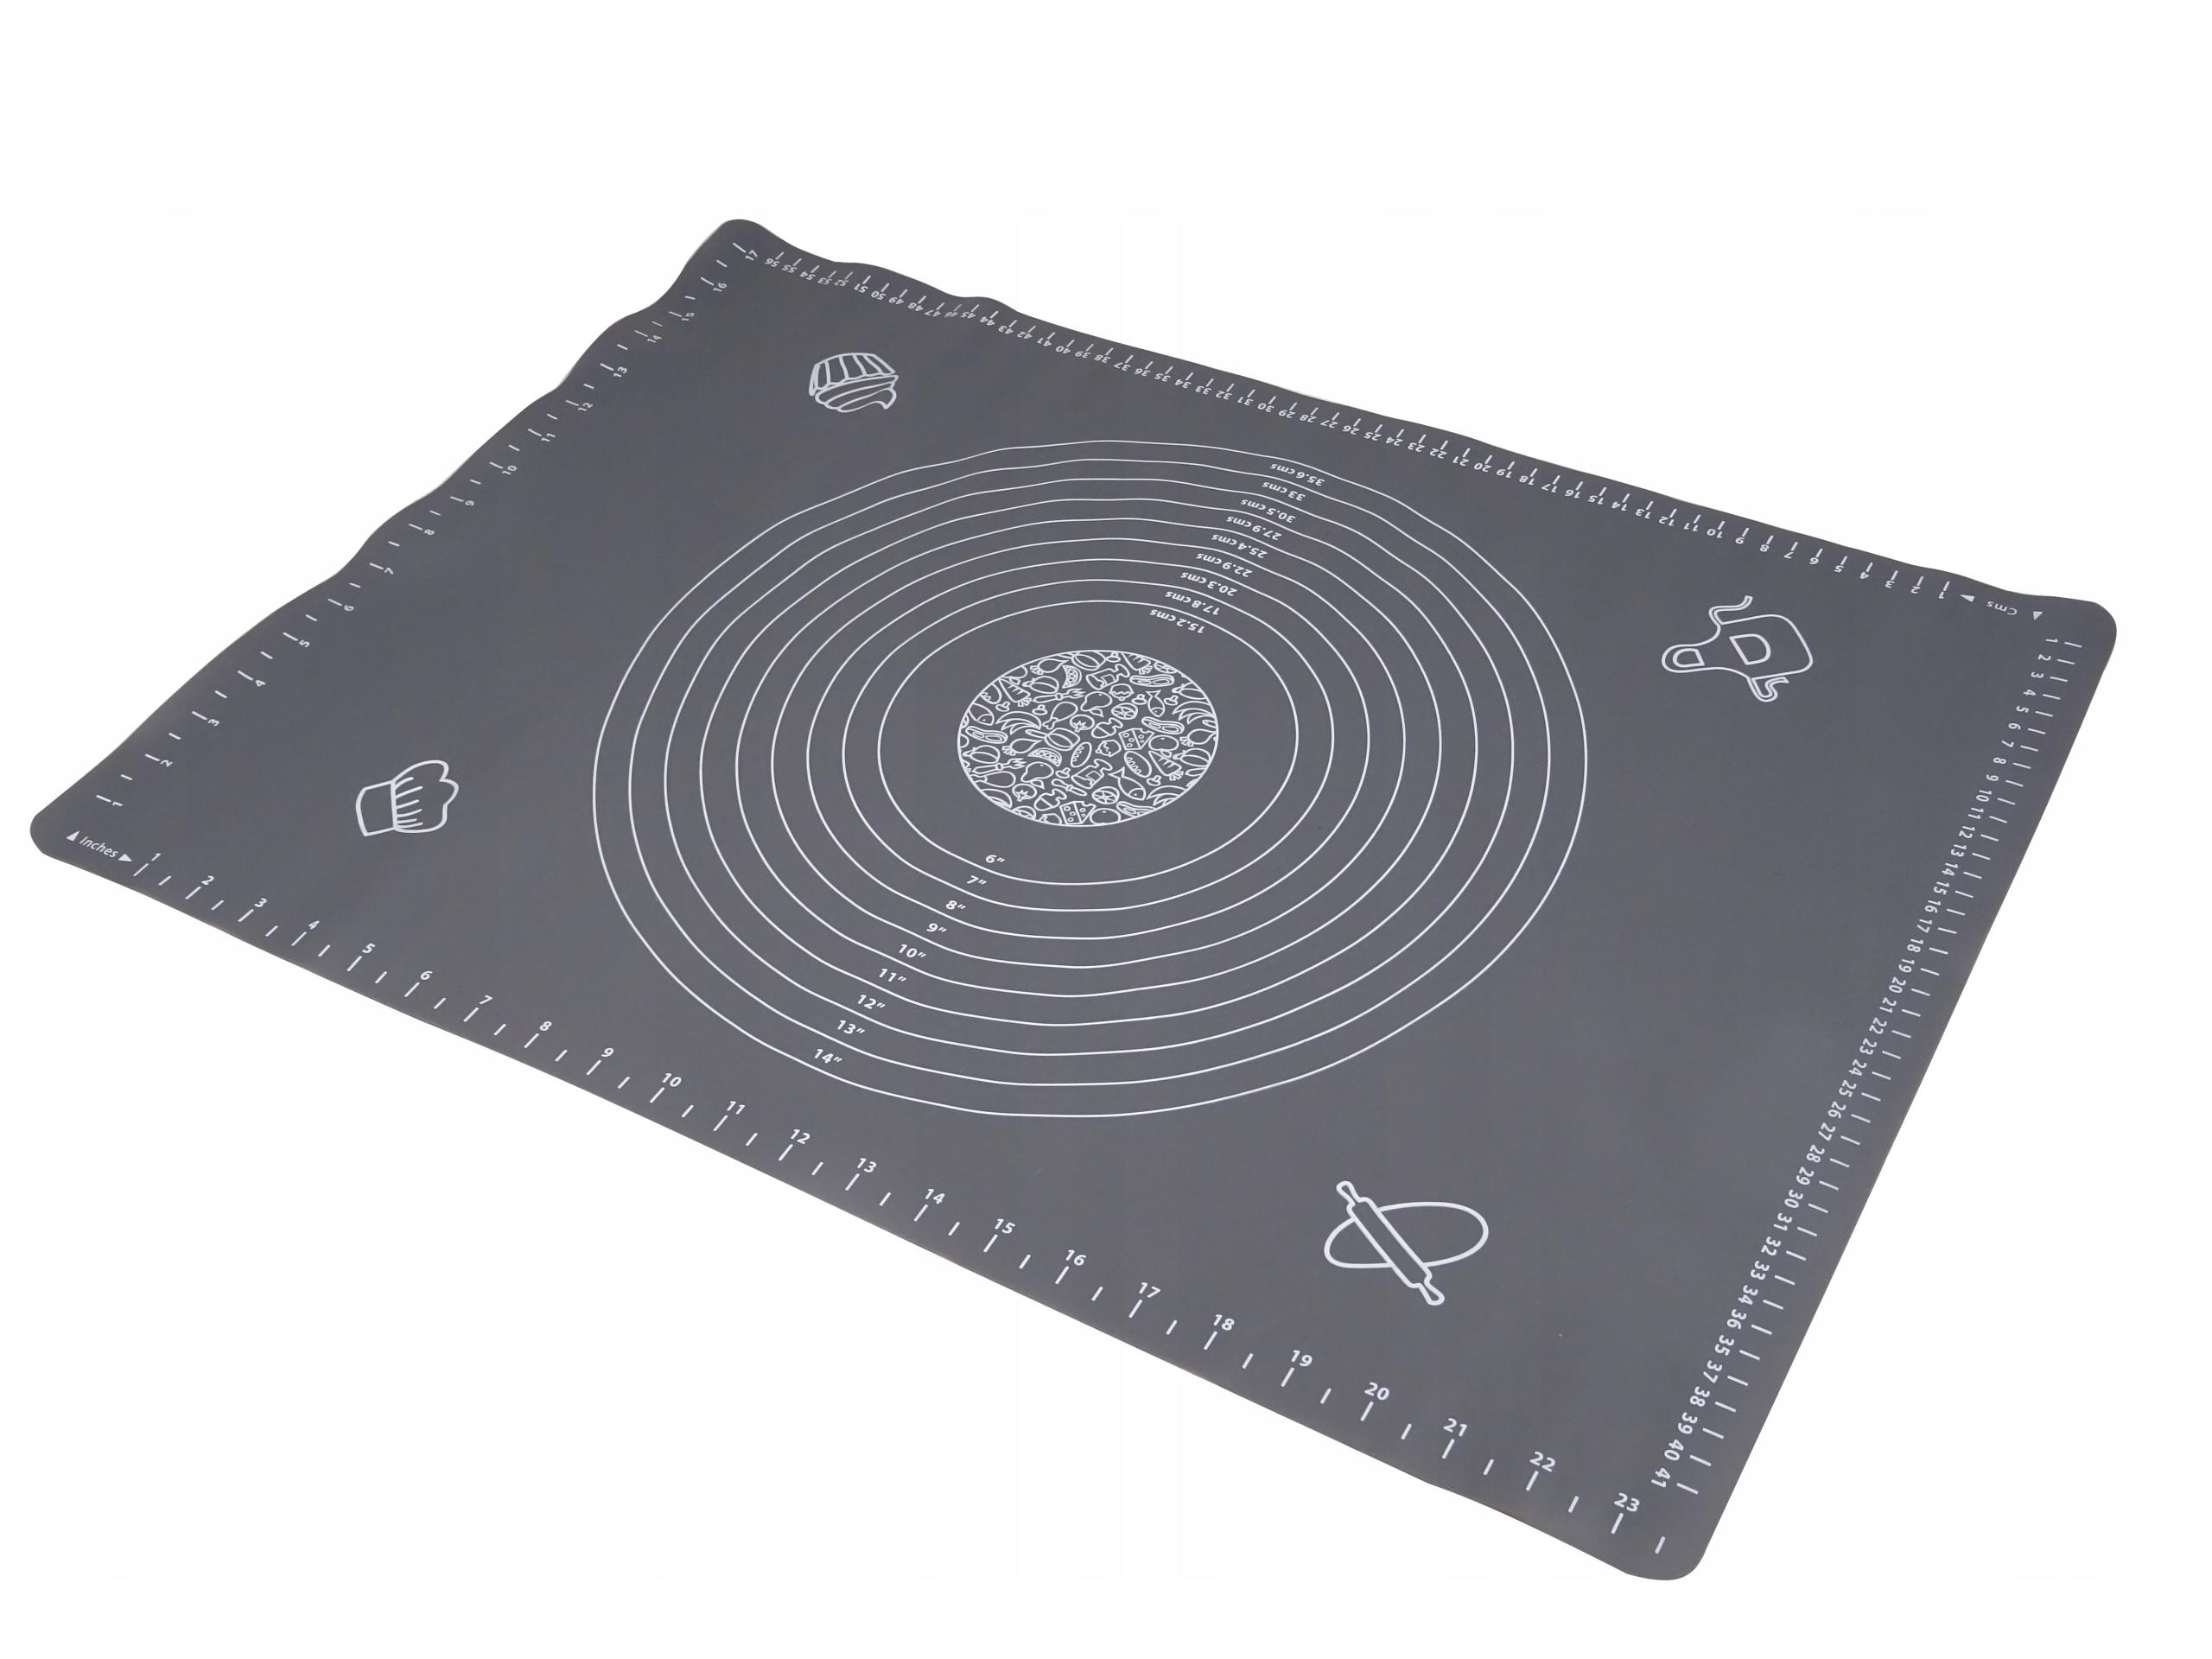 Силиконовый коврик Подушка 64x45см XXL 1537